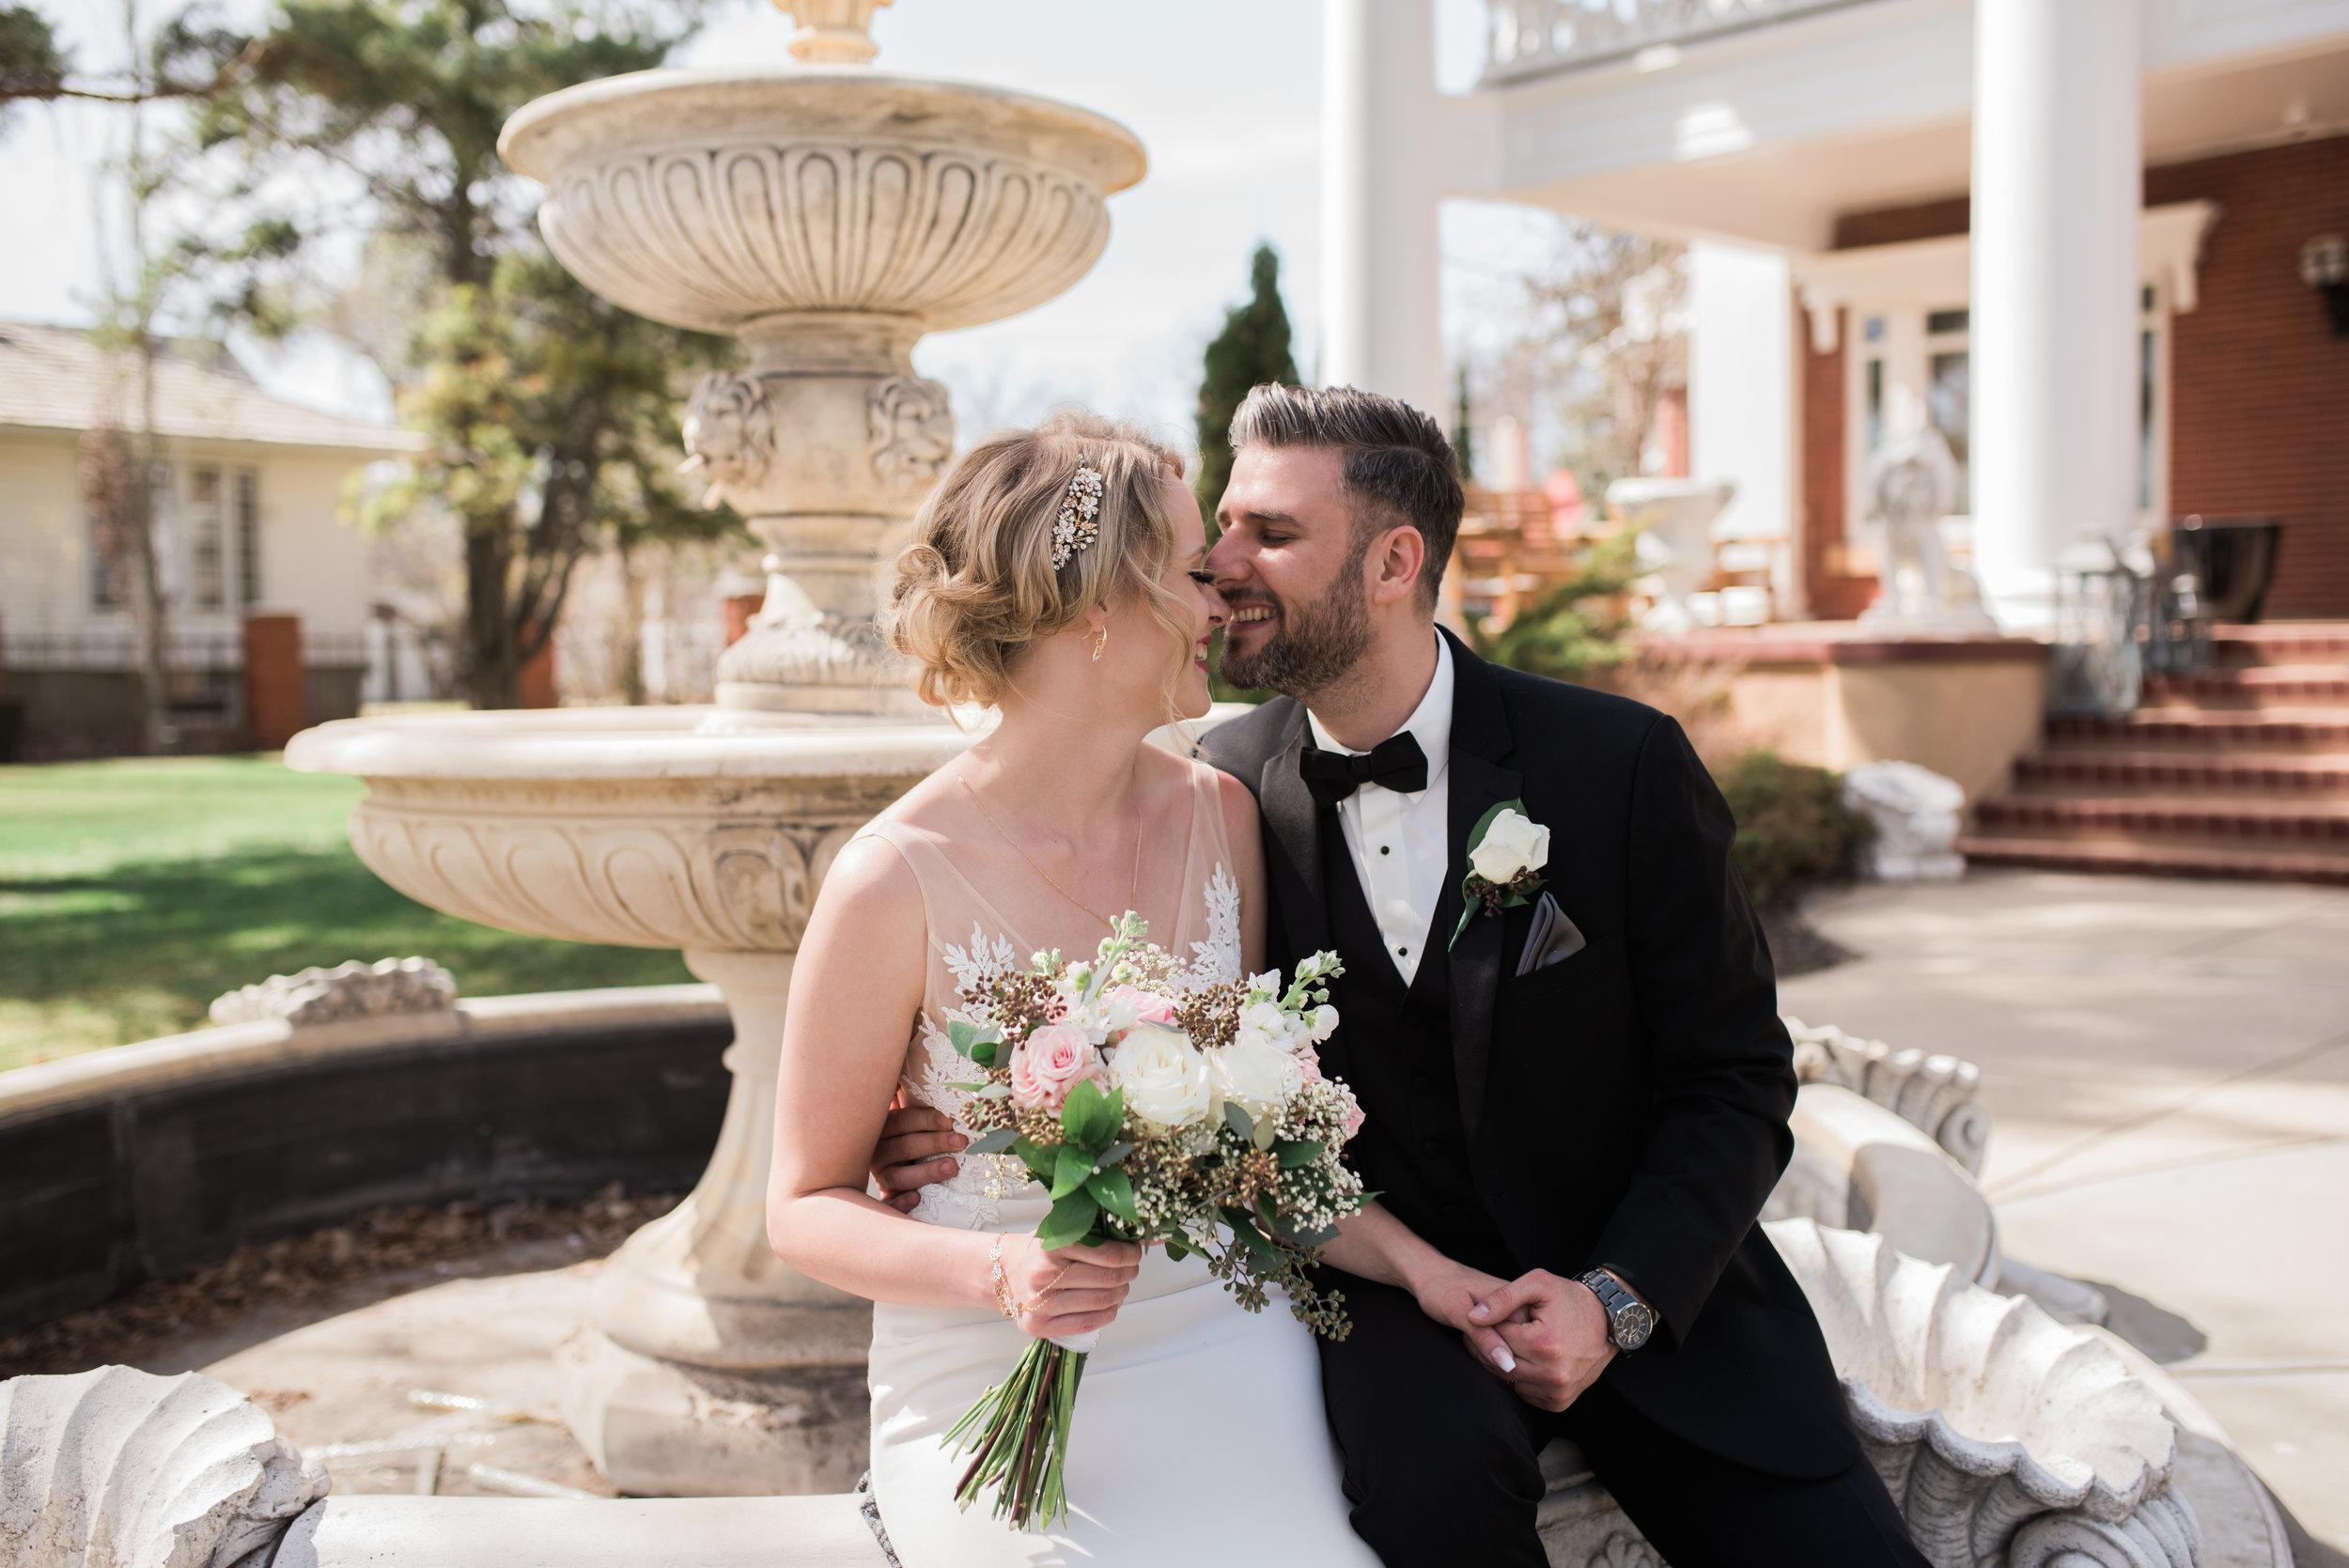 Ali Samantha Wedding 788.jpg